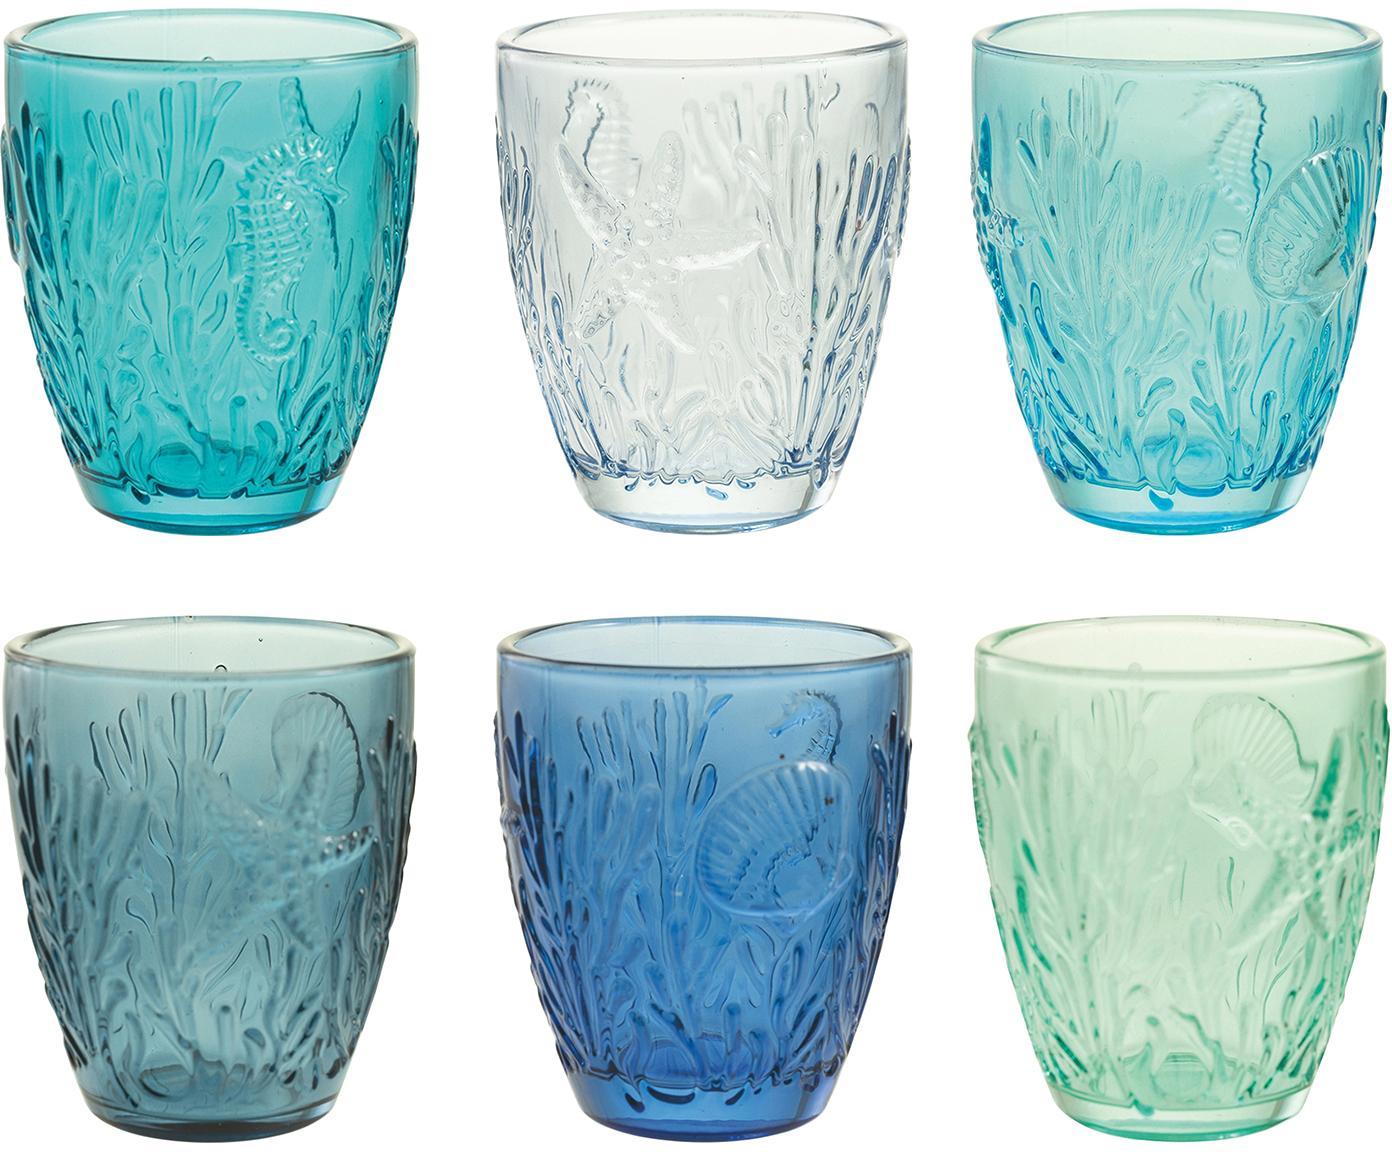 Set 6 bicchieri acqua Pantelleria, Vetro, Tonalità blu, Ø 8 x 10 cm